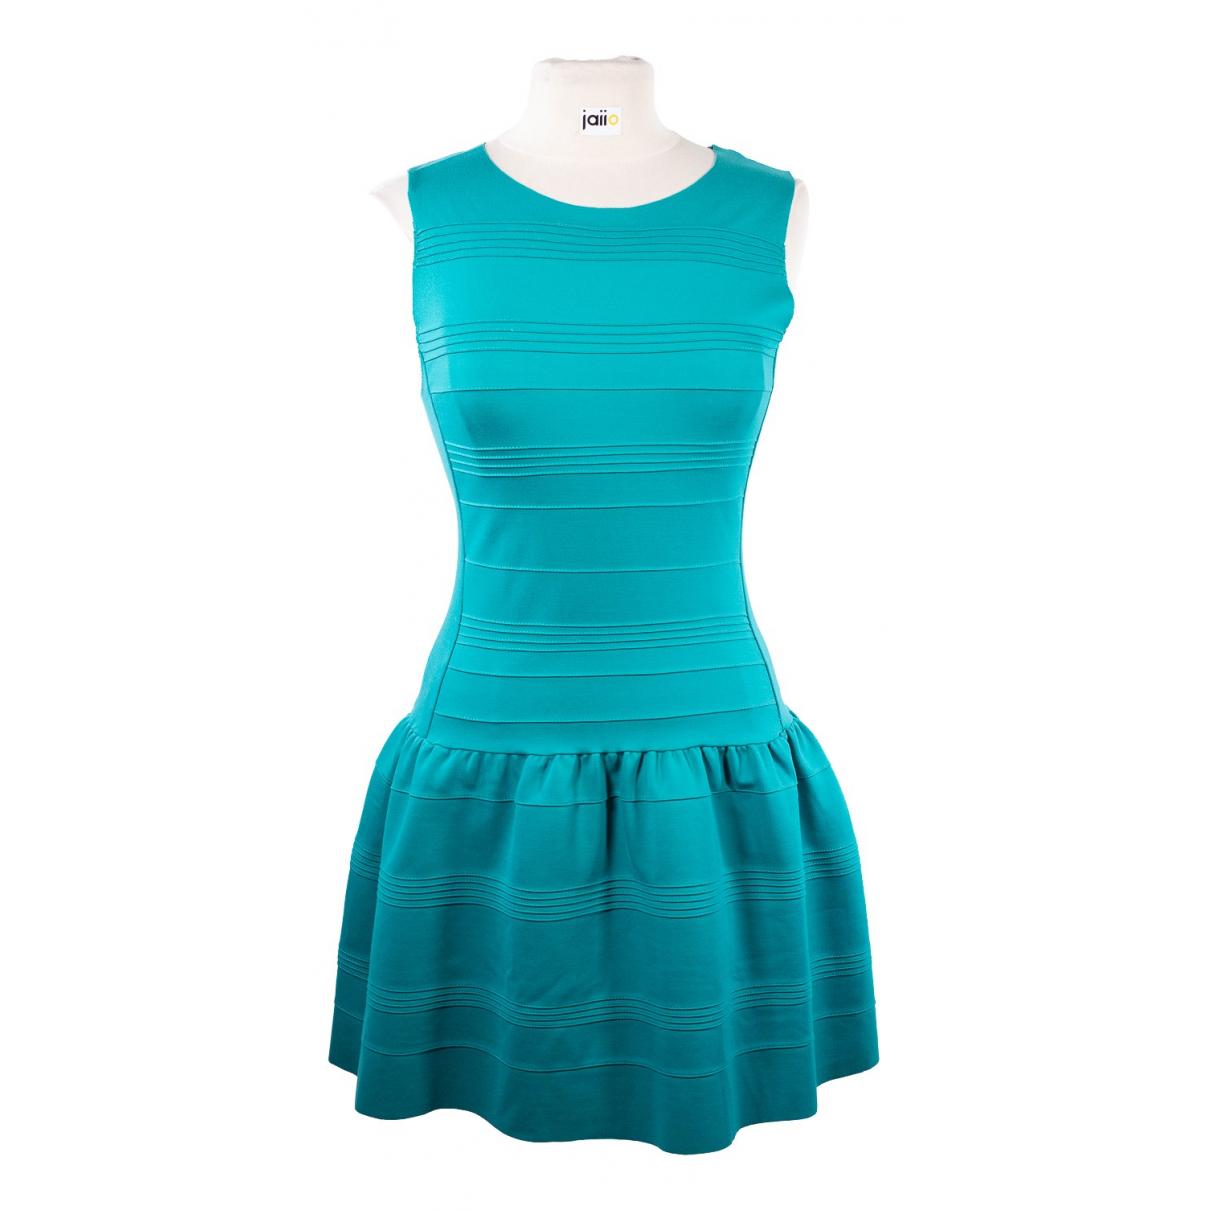 Maje N Green dress for Women 38 FR